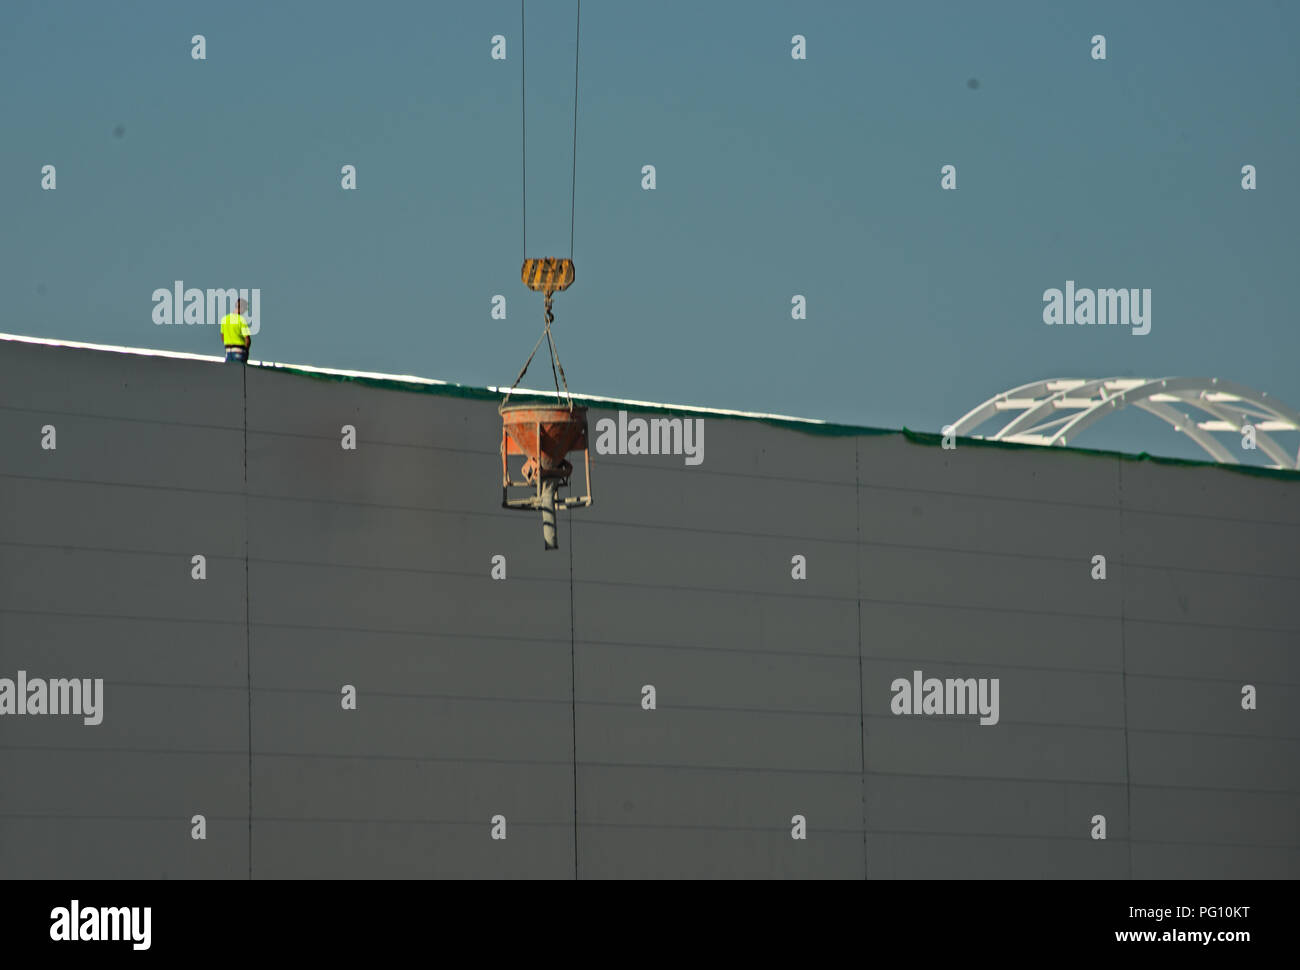 NOVI SAD, SERBIA - July 14th: Worker supervising crane lifting weight - Stock Image